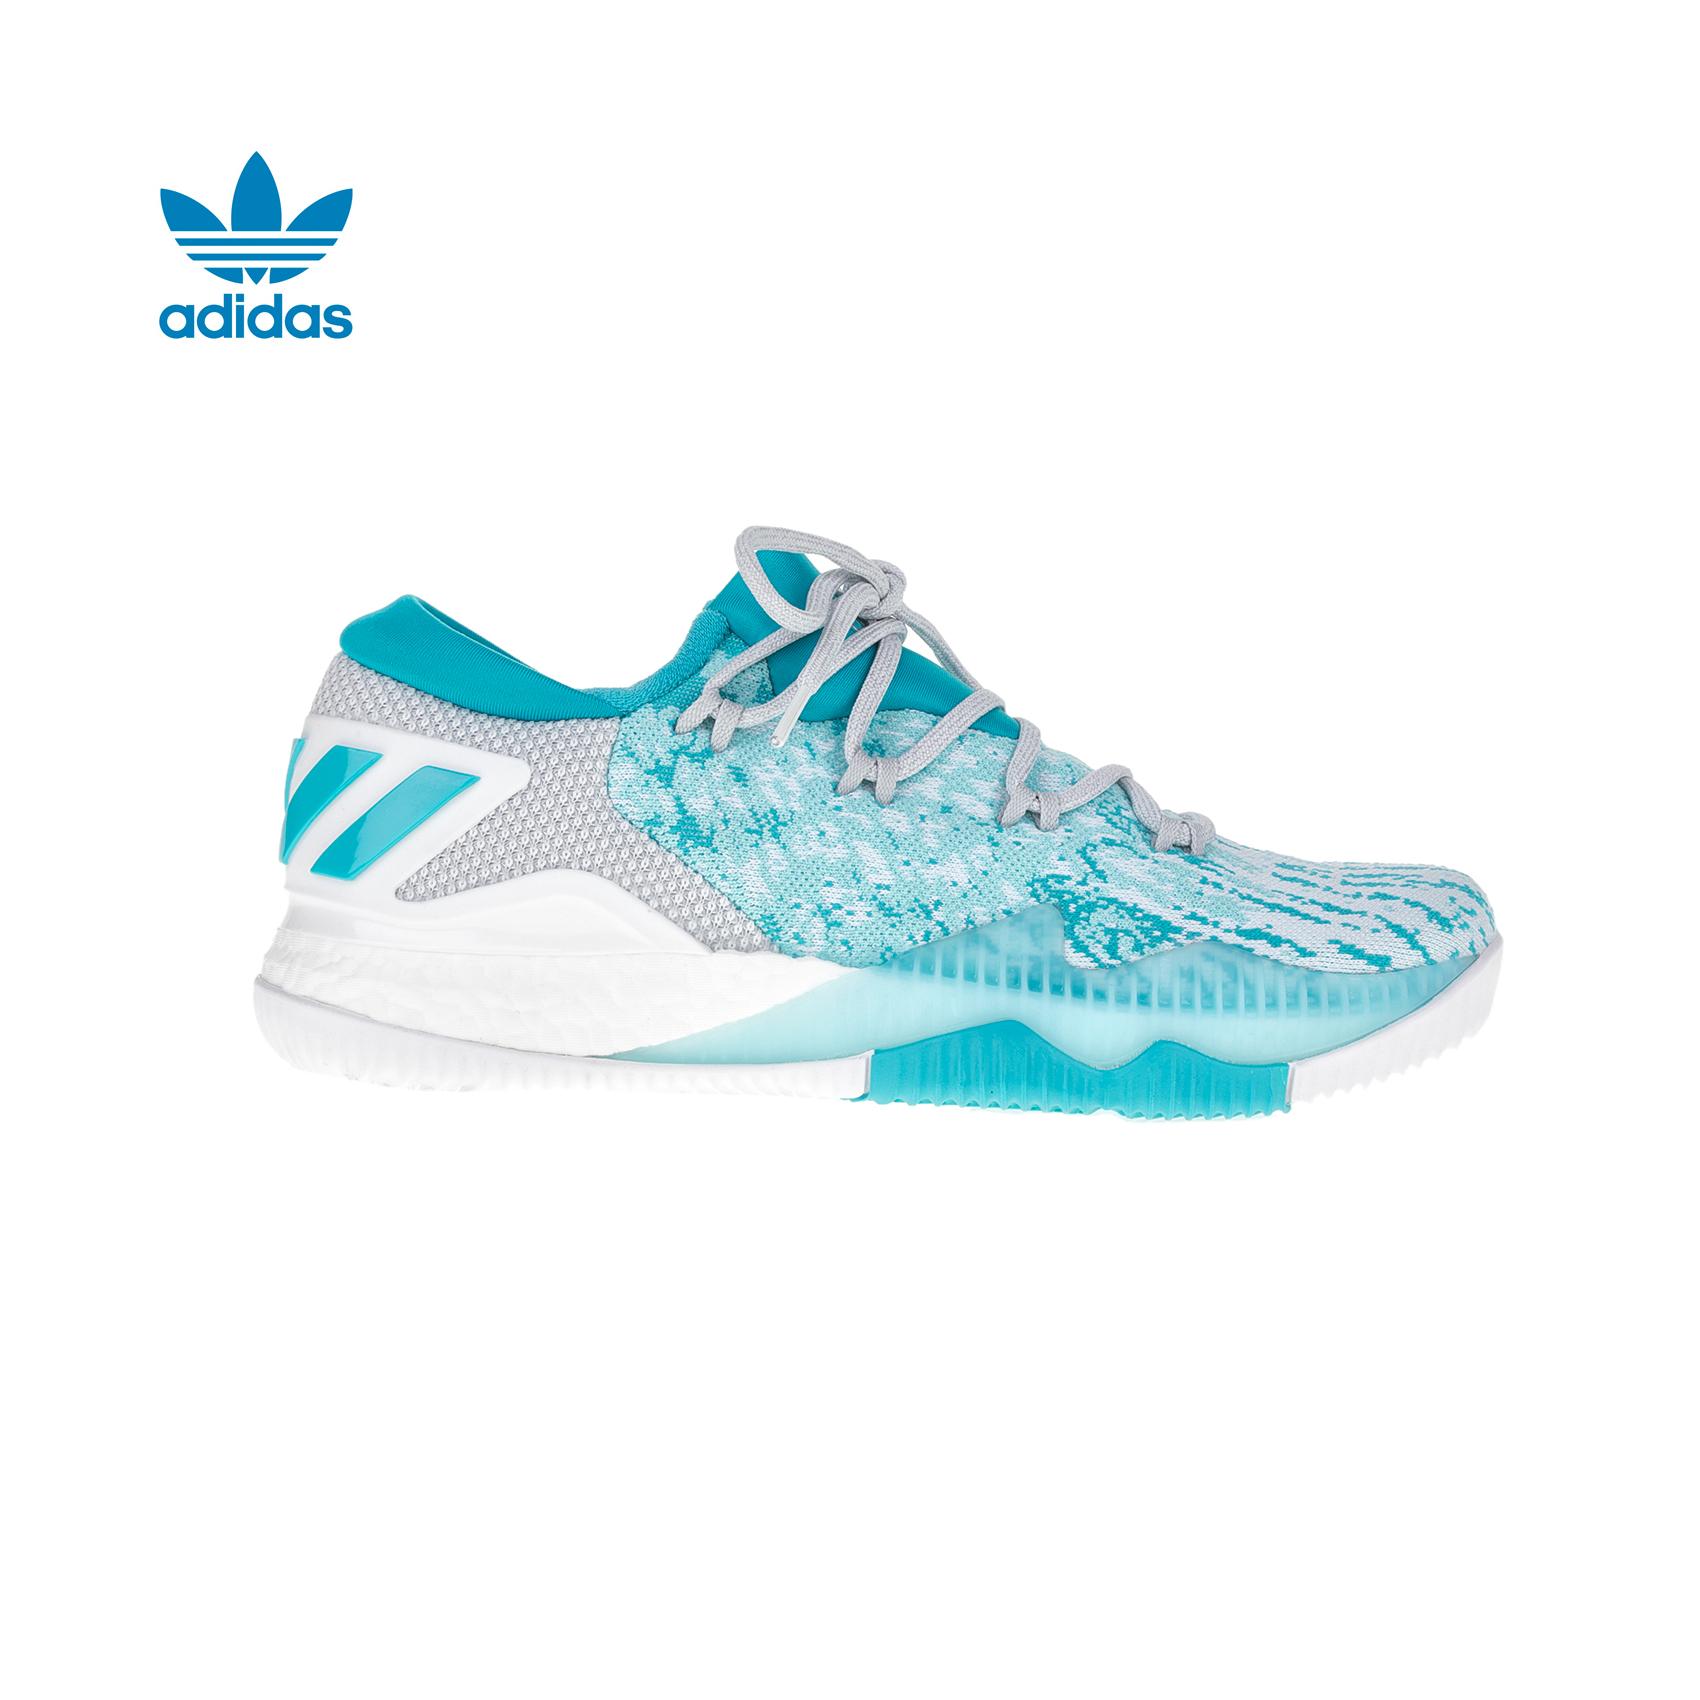 adidas Originals - Ανδρικά παπούτσια μπάσκετ adidas Crazylight Boost low 2016 PK ανδρικά παπούτσια αθλητικά basketball